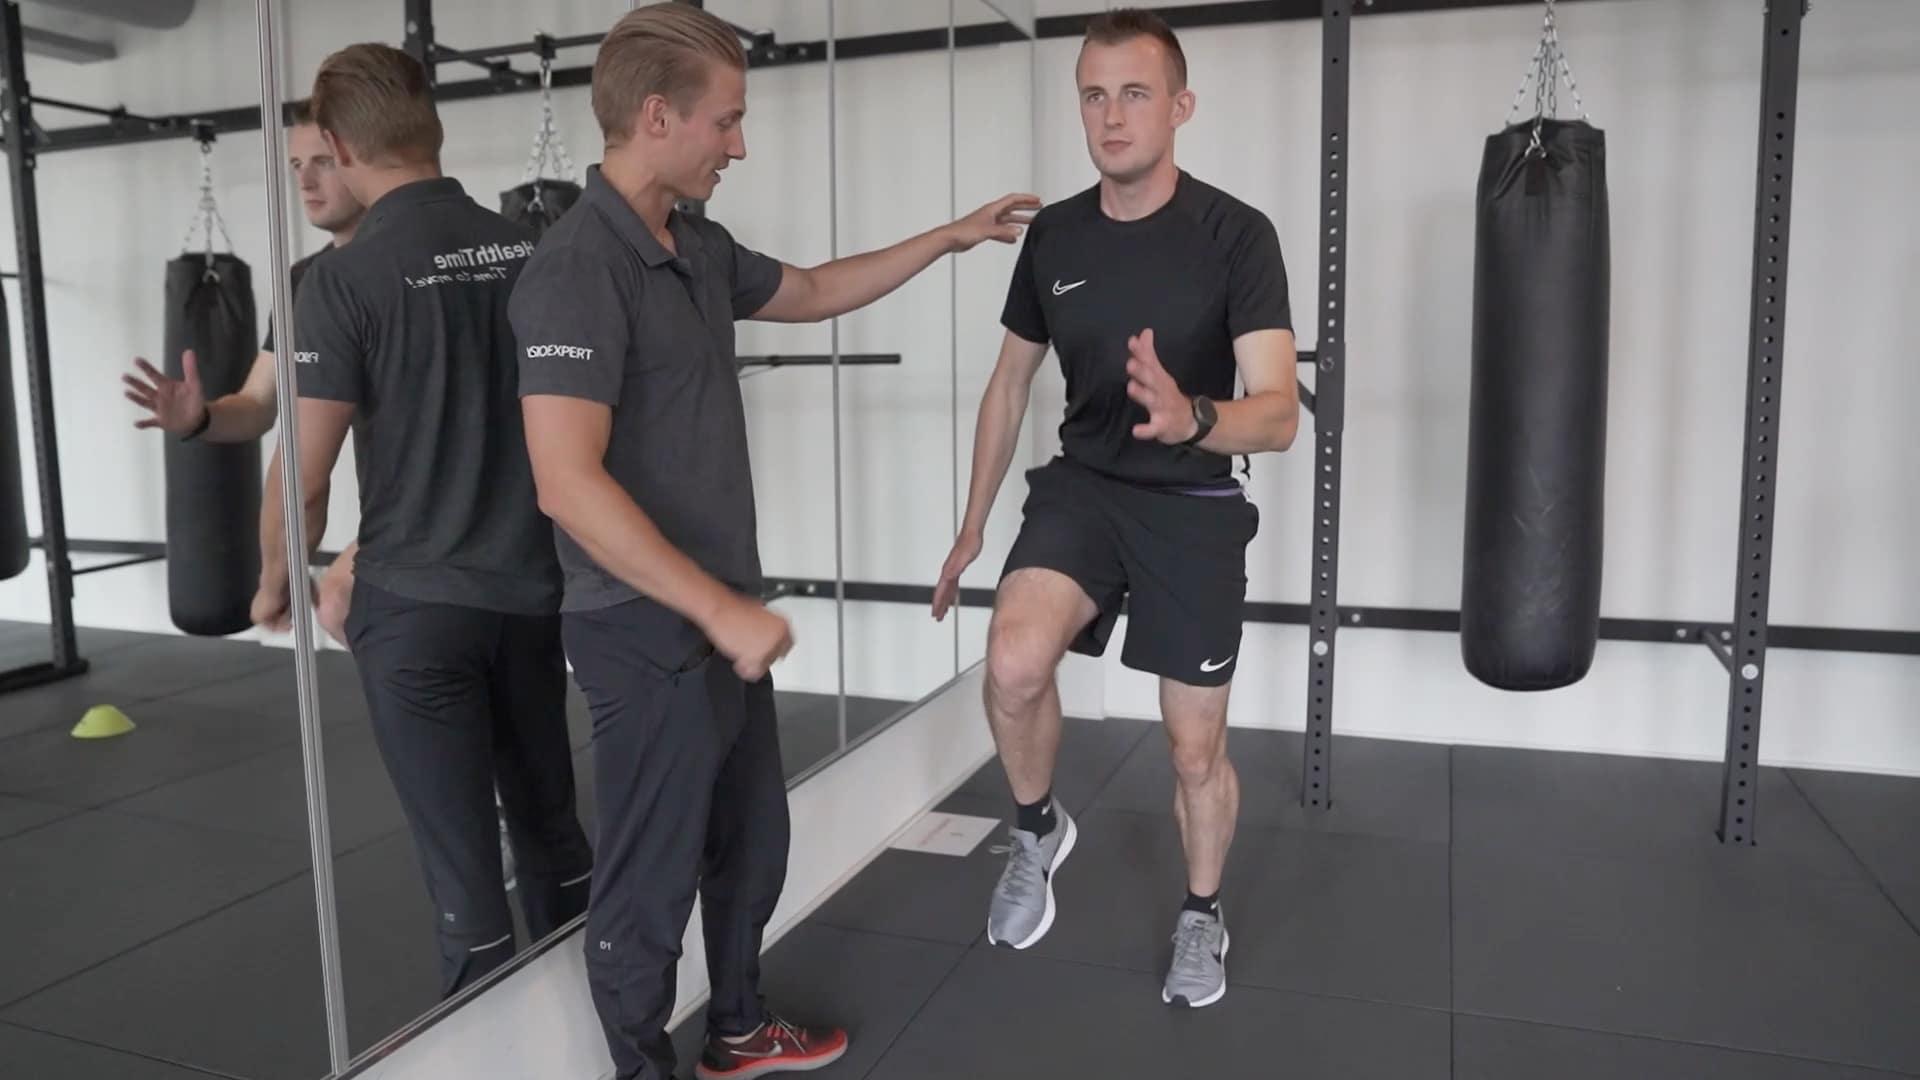 personal training professionele begeleiding boksfit boksen groepsles trainingszaal